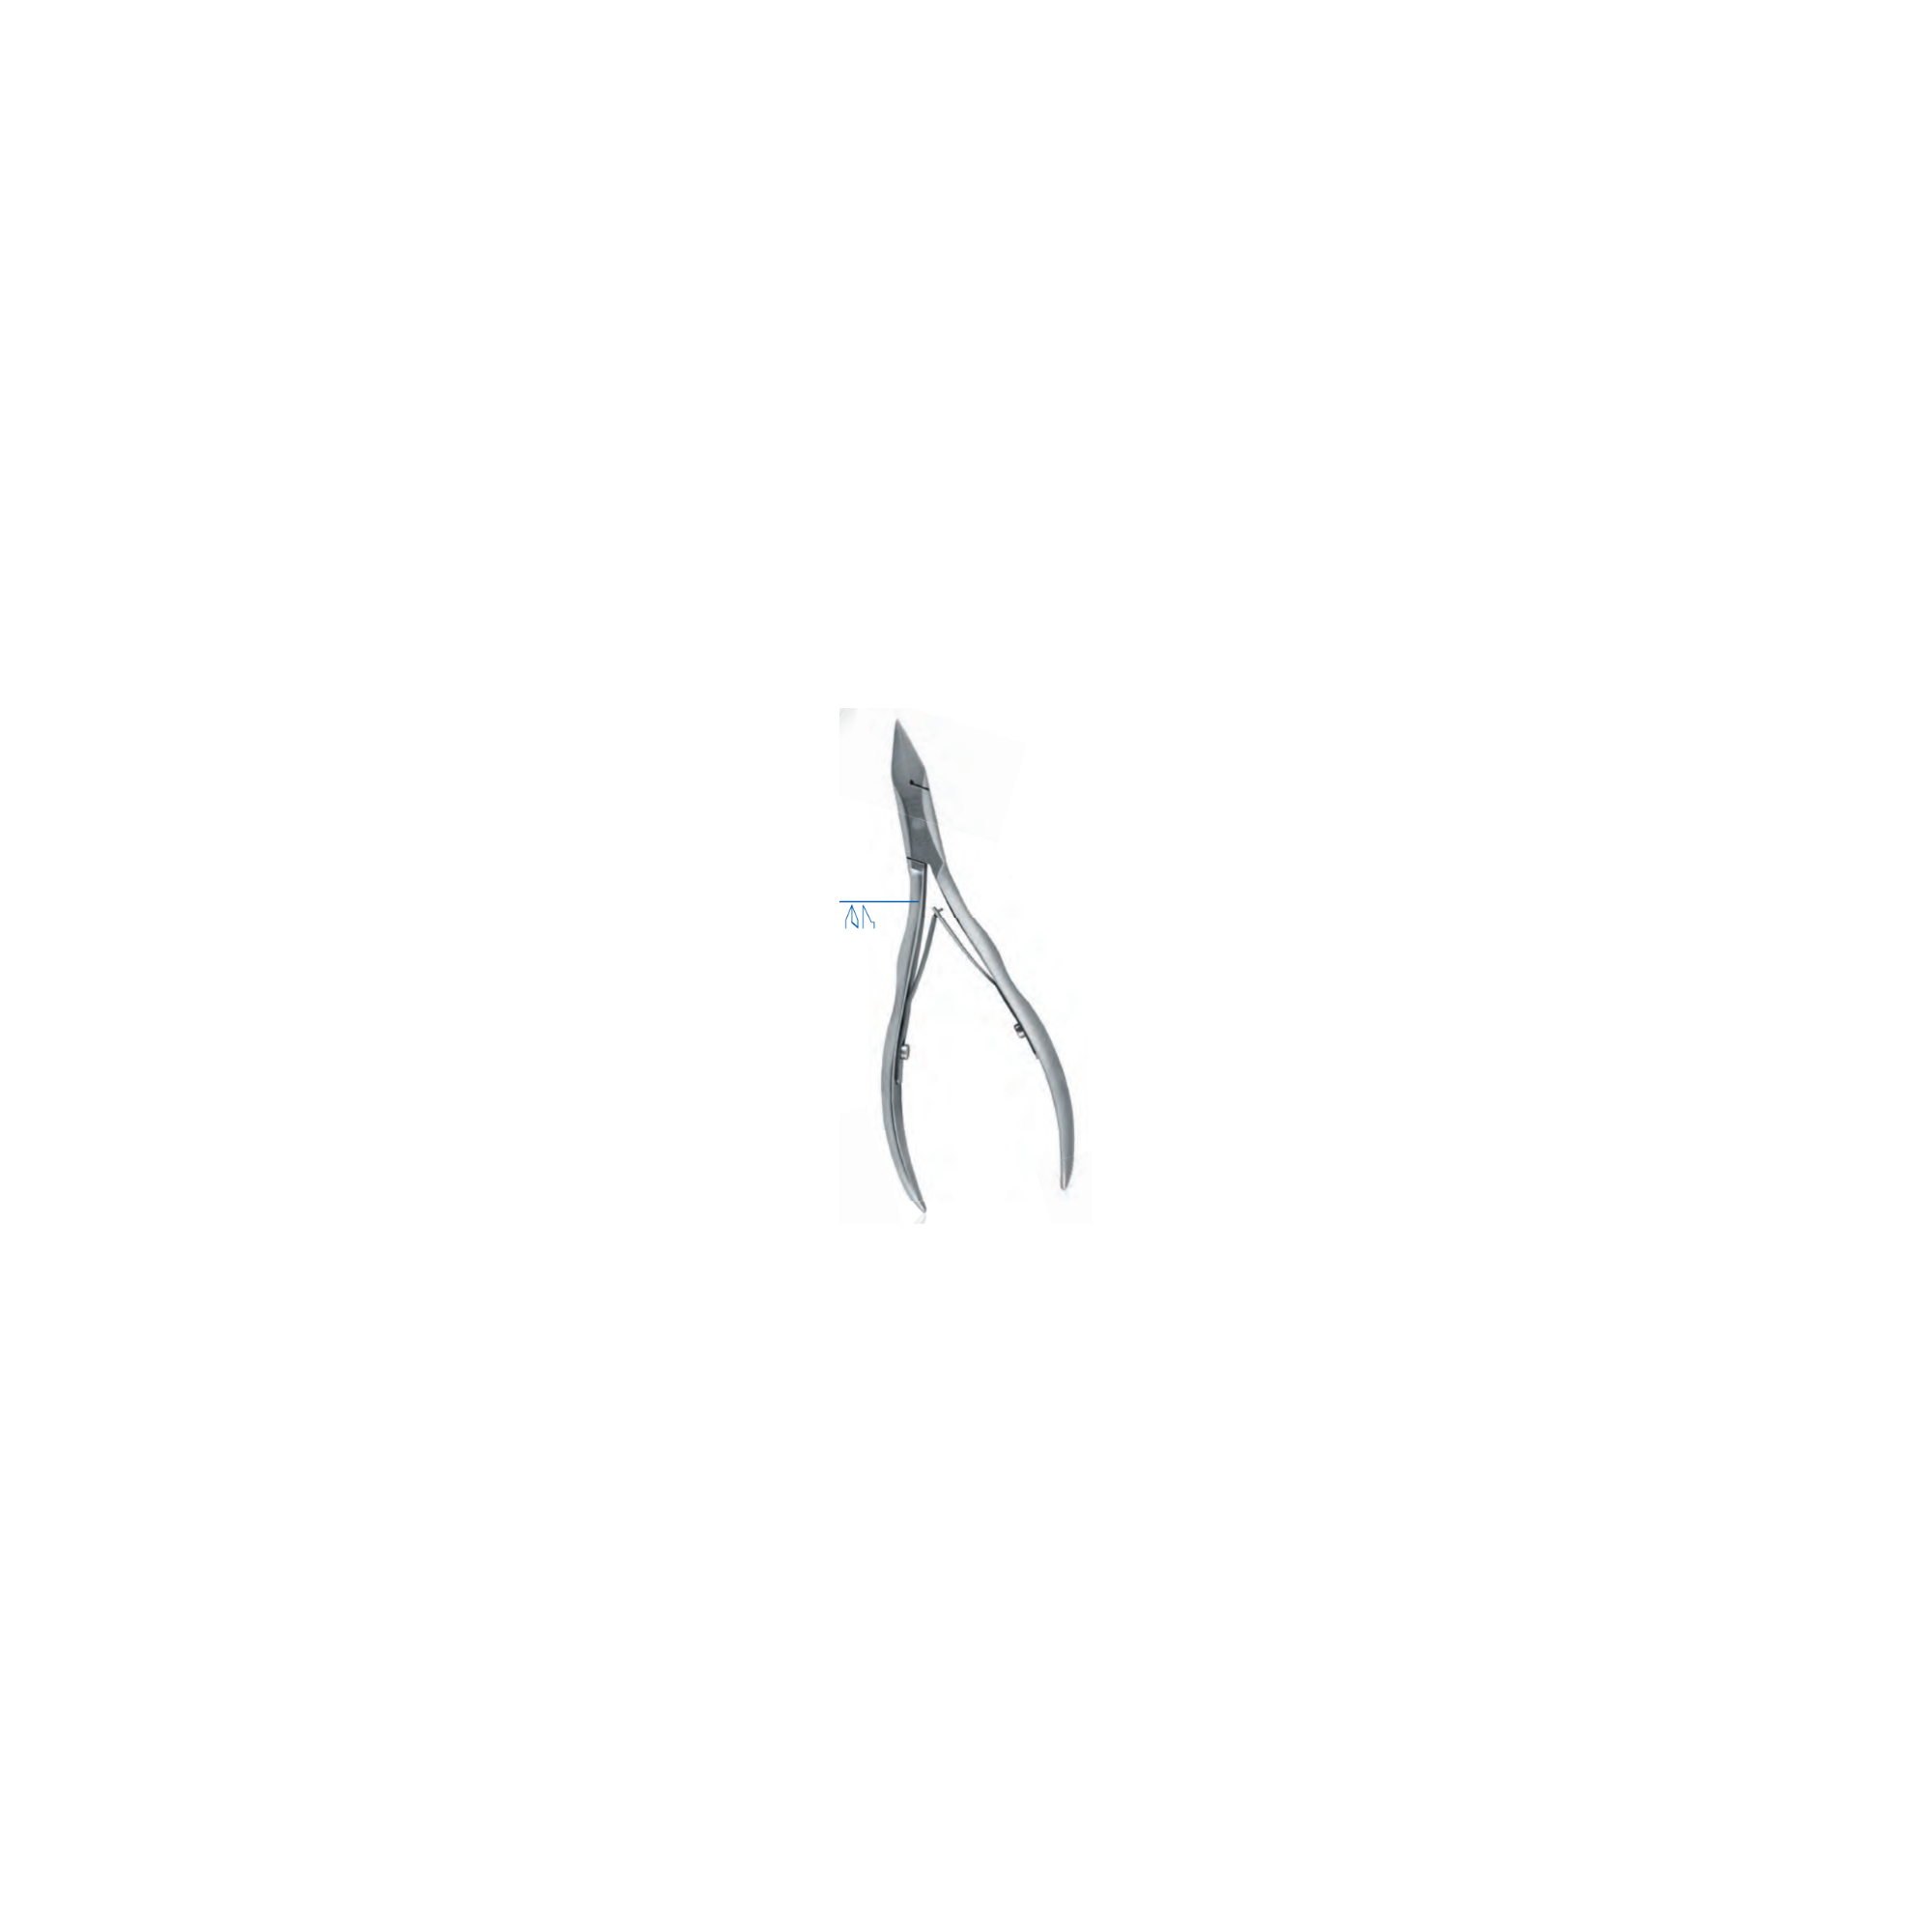 Pince à ongles - Coupe droite - Mors plats - 13 cm - Dovo